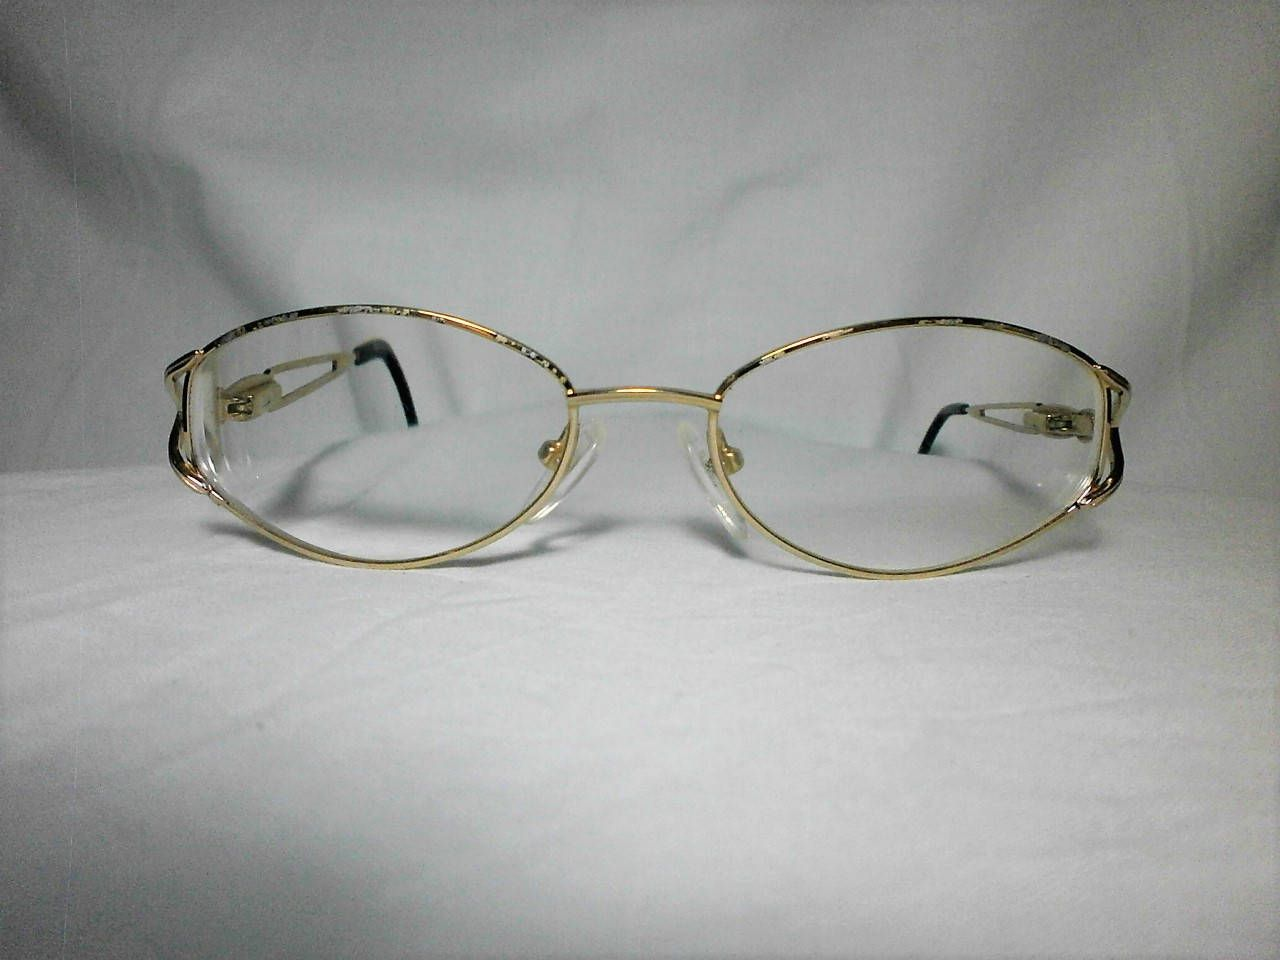 e02ec0684f77 Better Self F6018 Metal Optical Frames Decorate Temple Eyewear